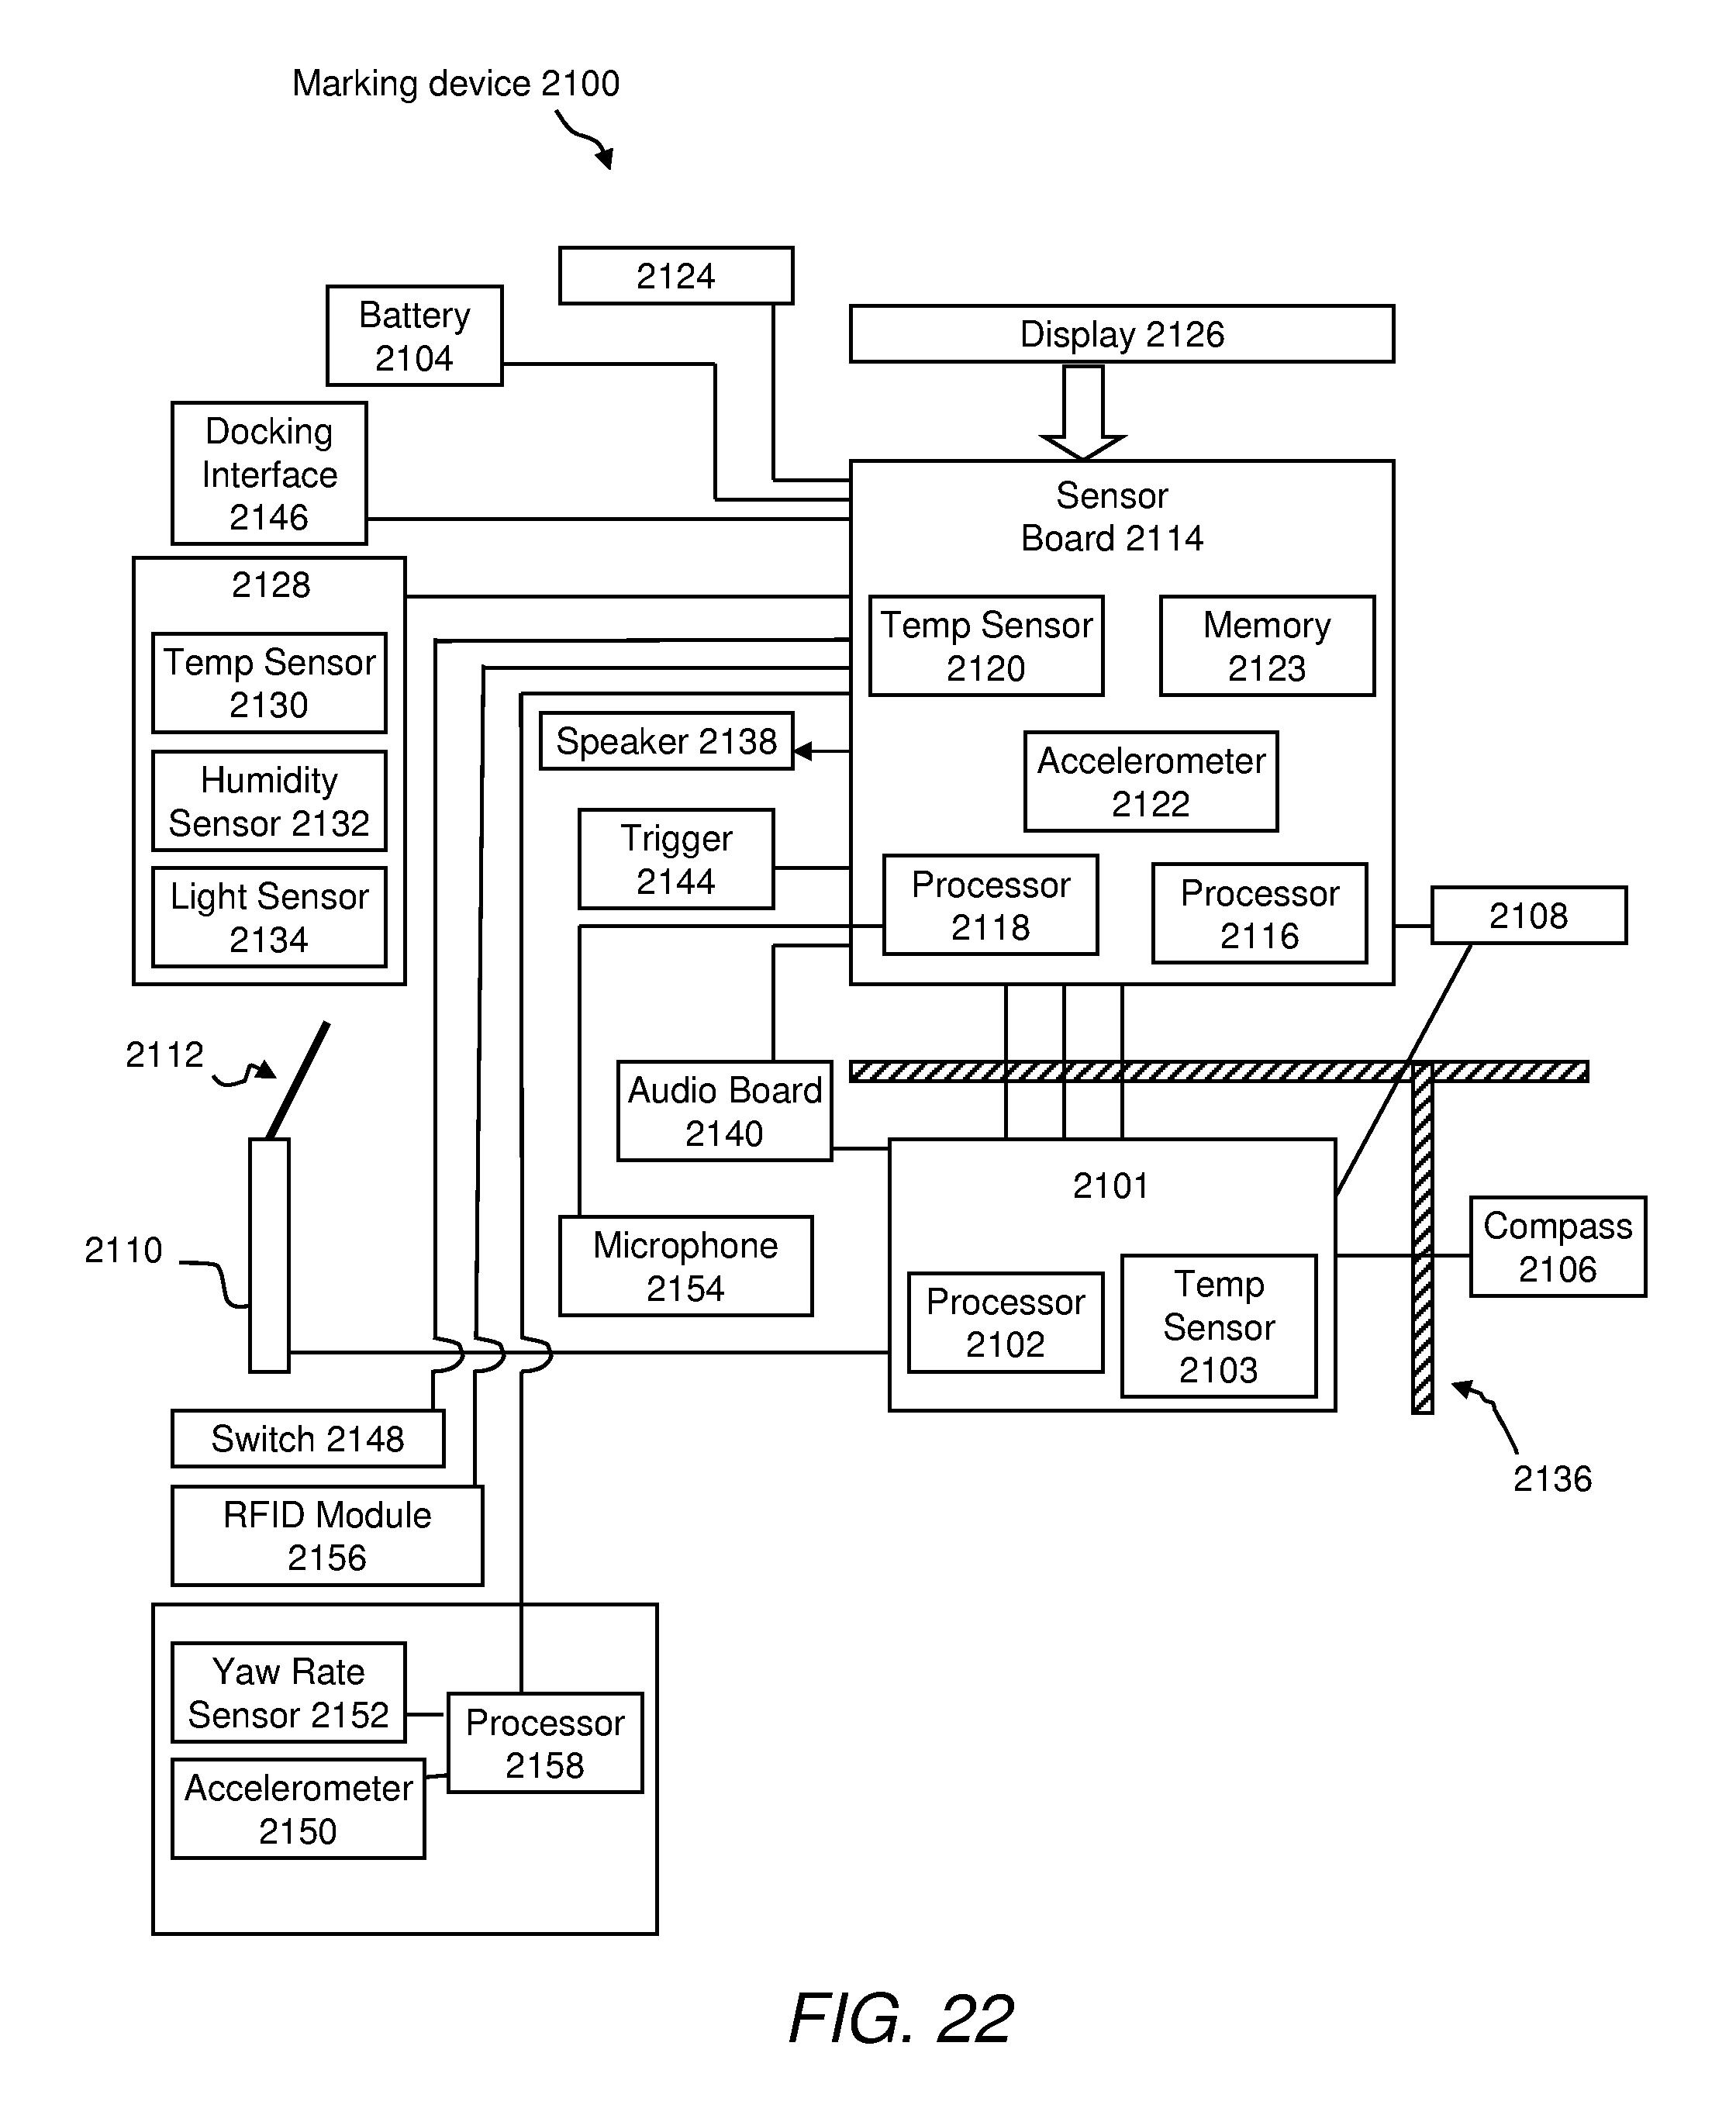 Quasar Electric Scooter Wiring Diagram : Quasar electric scooter wiring diagram